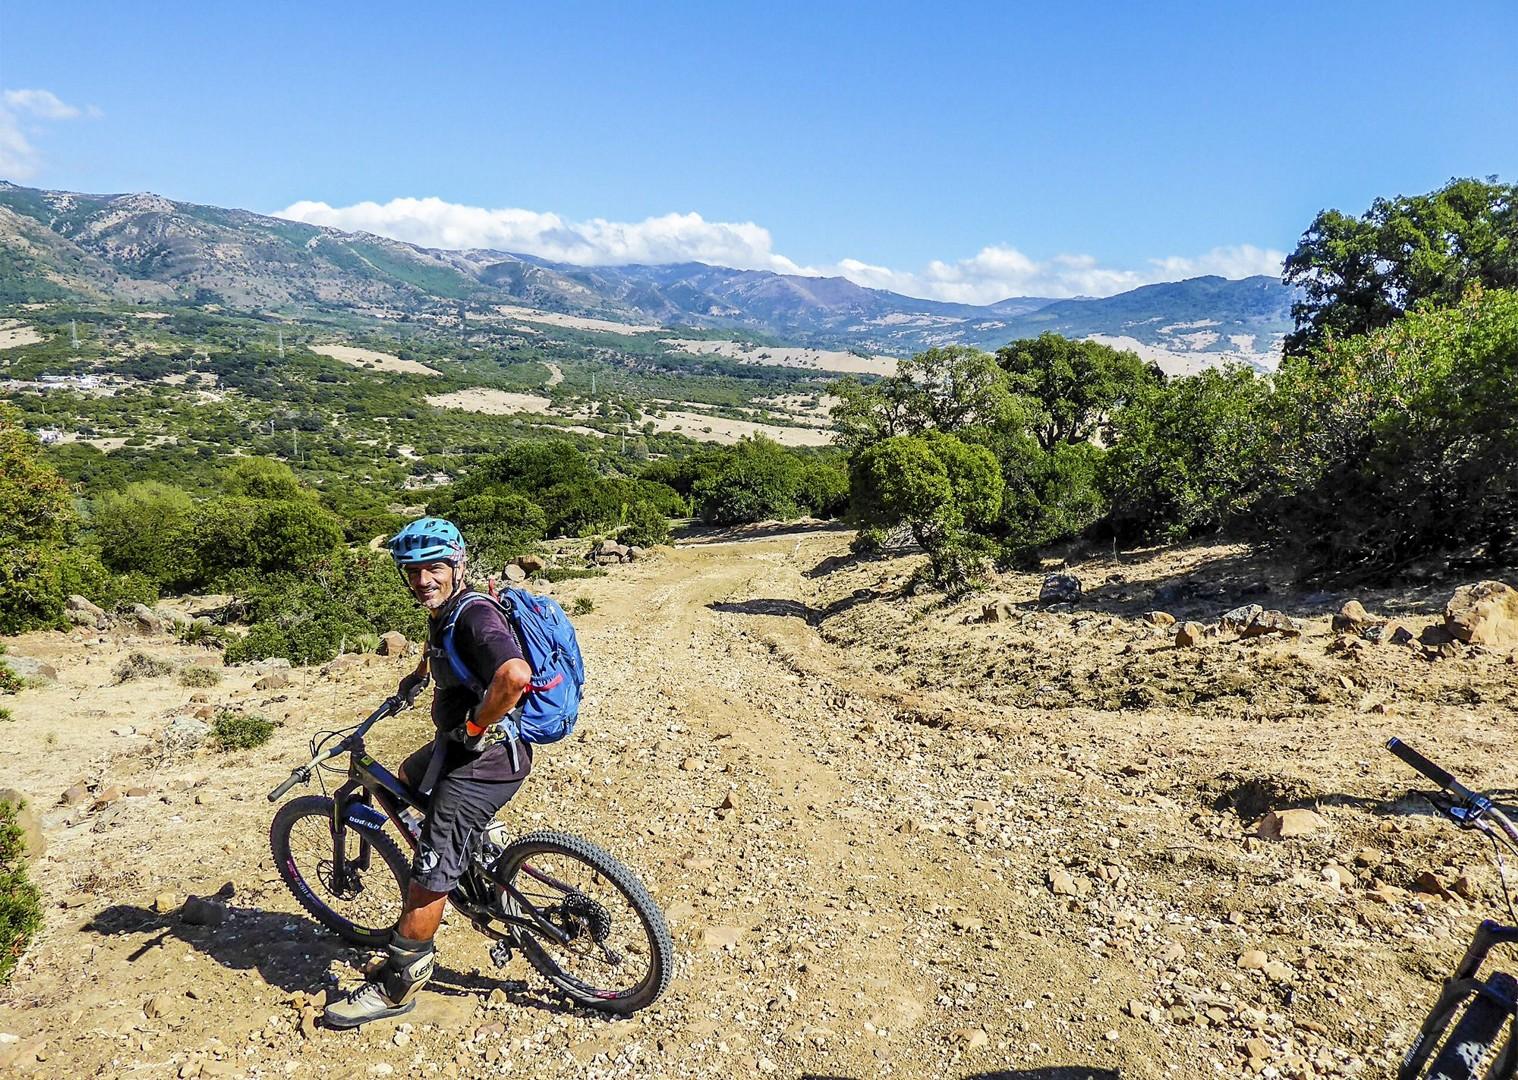 fun-trails-jimera-spain-saddle-skedaddle-andalucia.jpg - Spain - Awesome Andalucia - Guided Mountain Bike Holiday - Mountain Biking